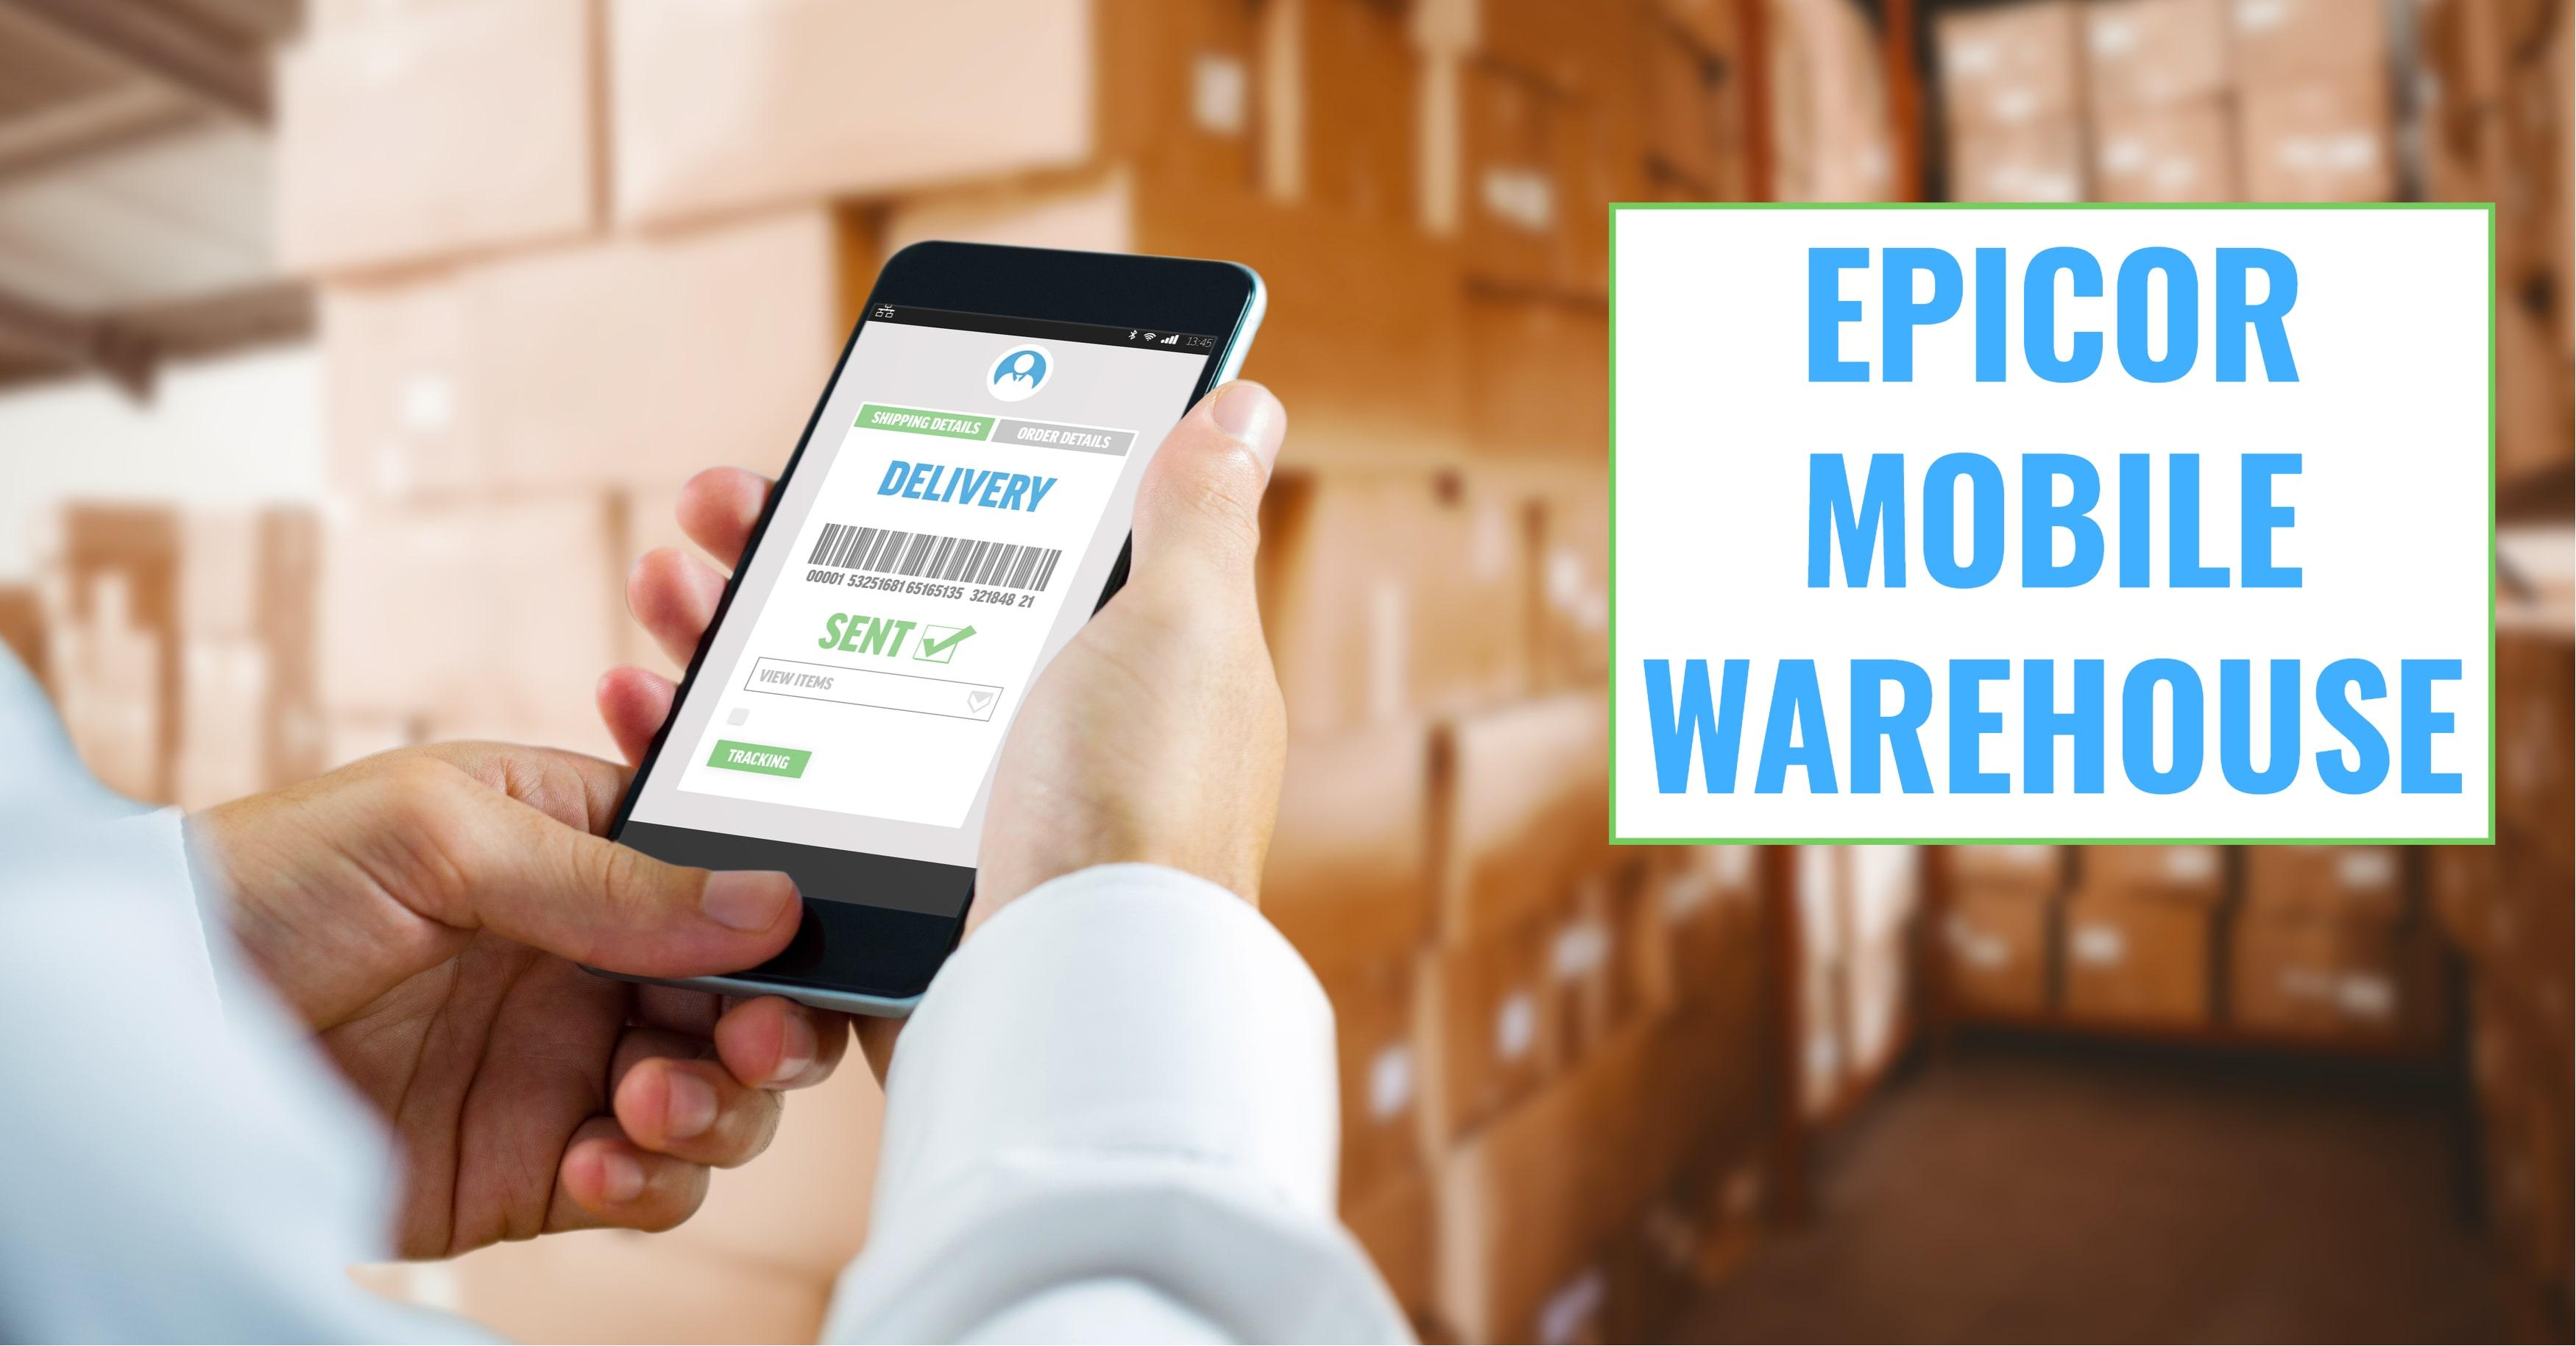 Epicor Mobile Warehouse